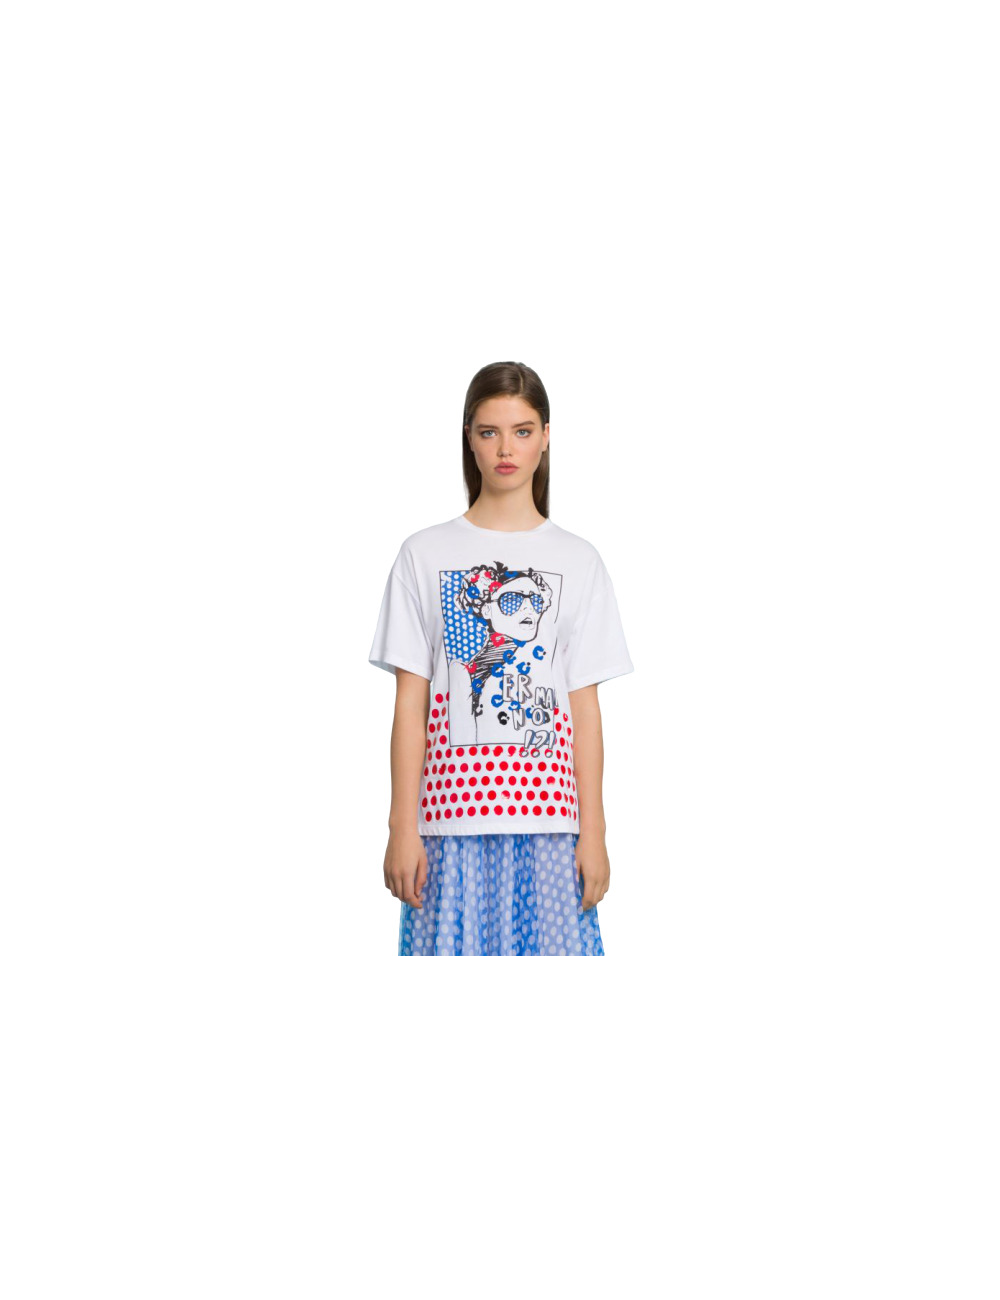 Printed T-shirt Ermanno Scervino - BIG BOSS MEGEVE